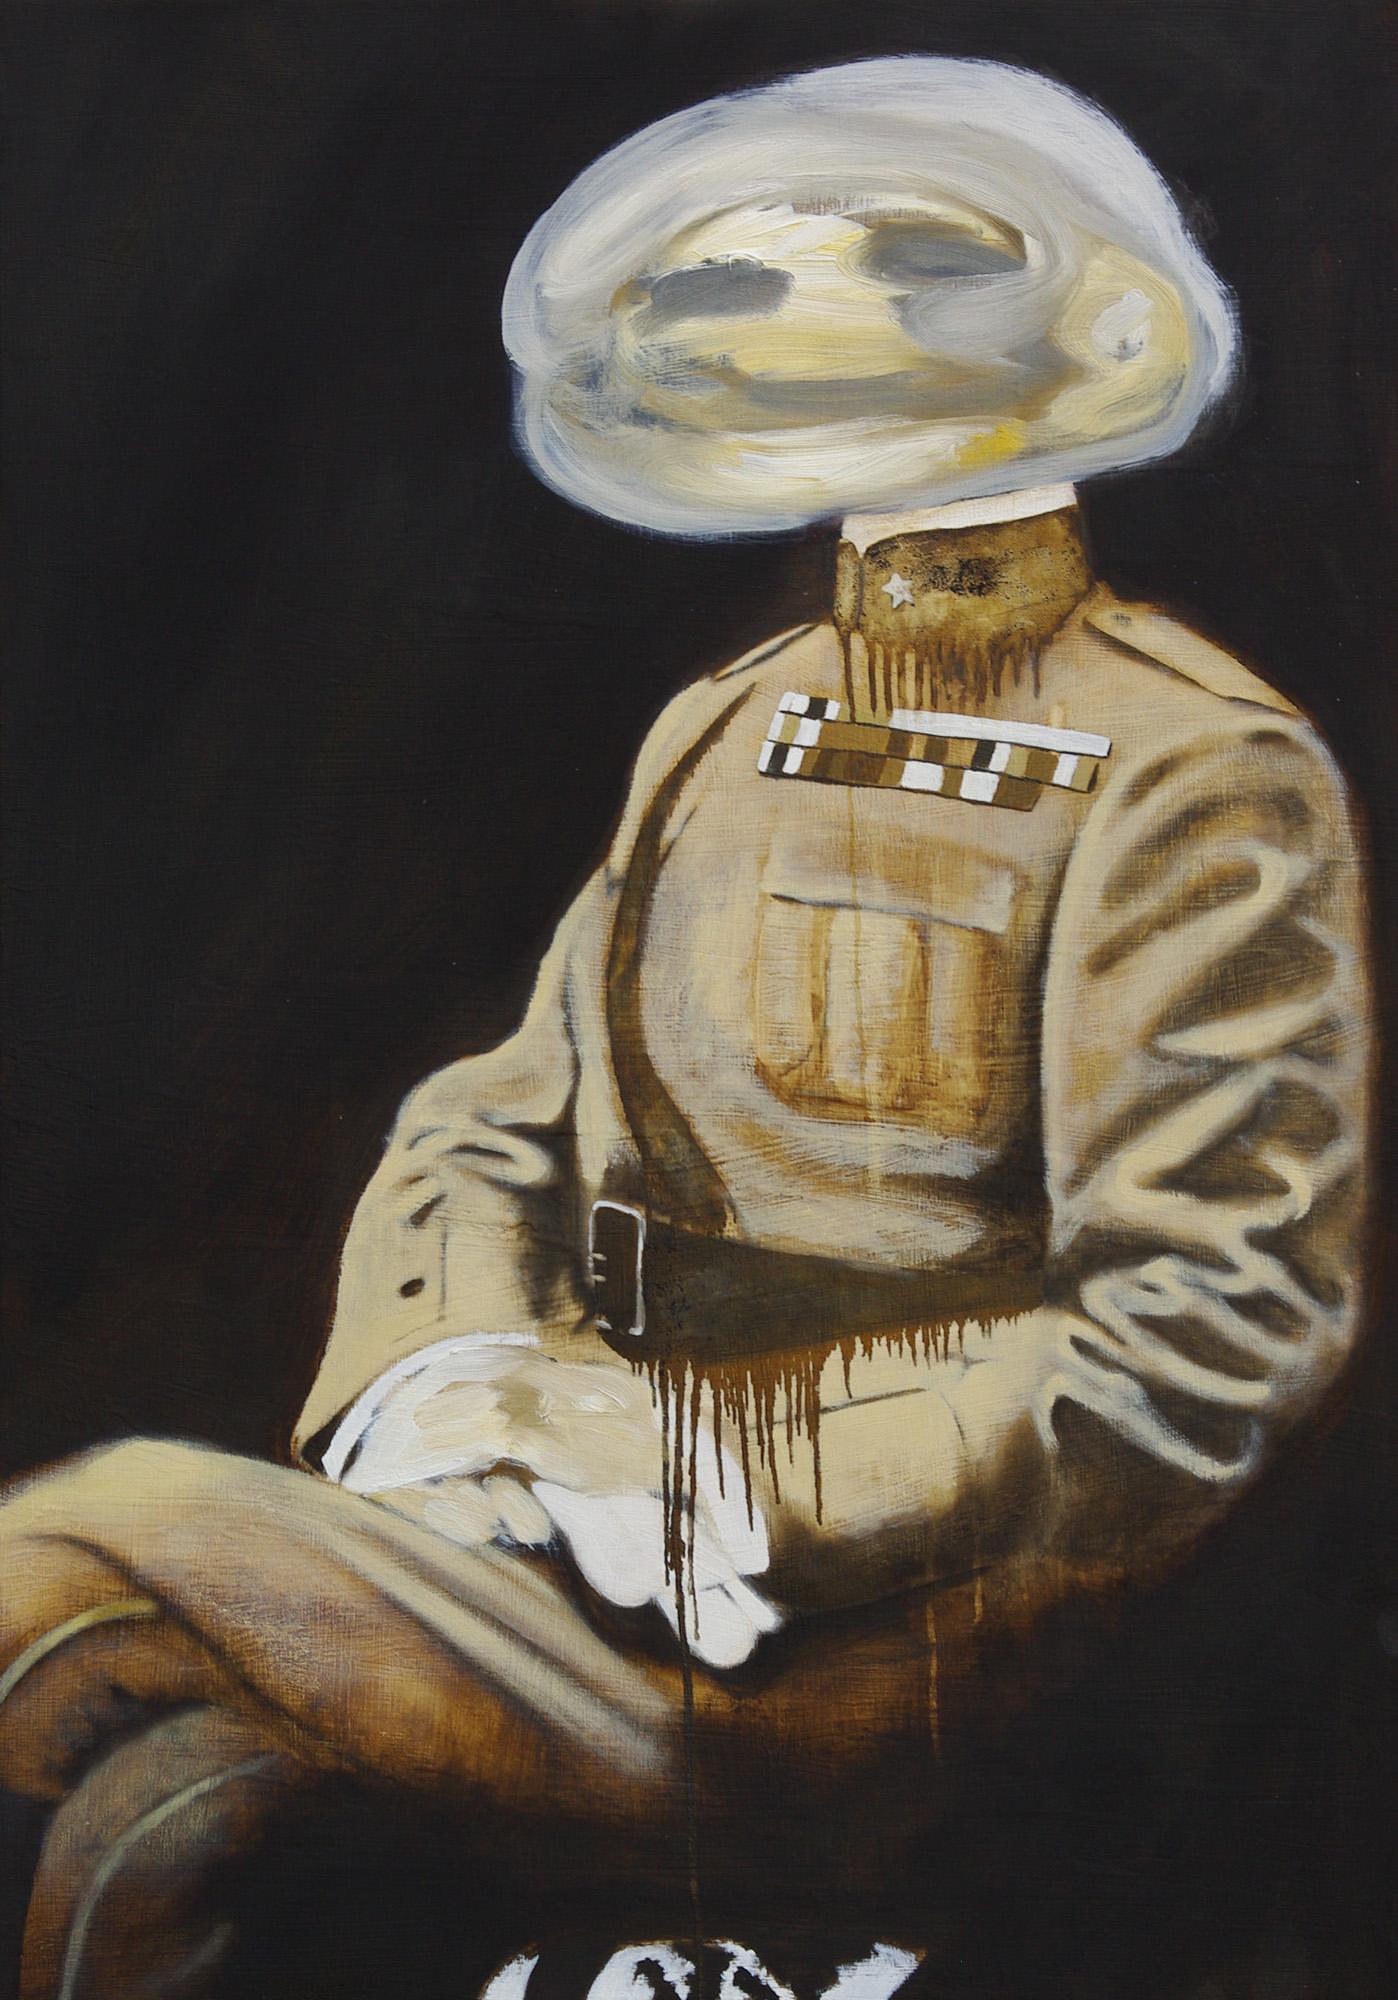 Il Generale, Olio su tavola, 88x125, 2014